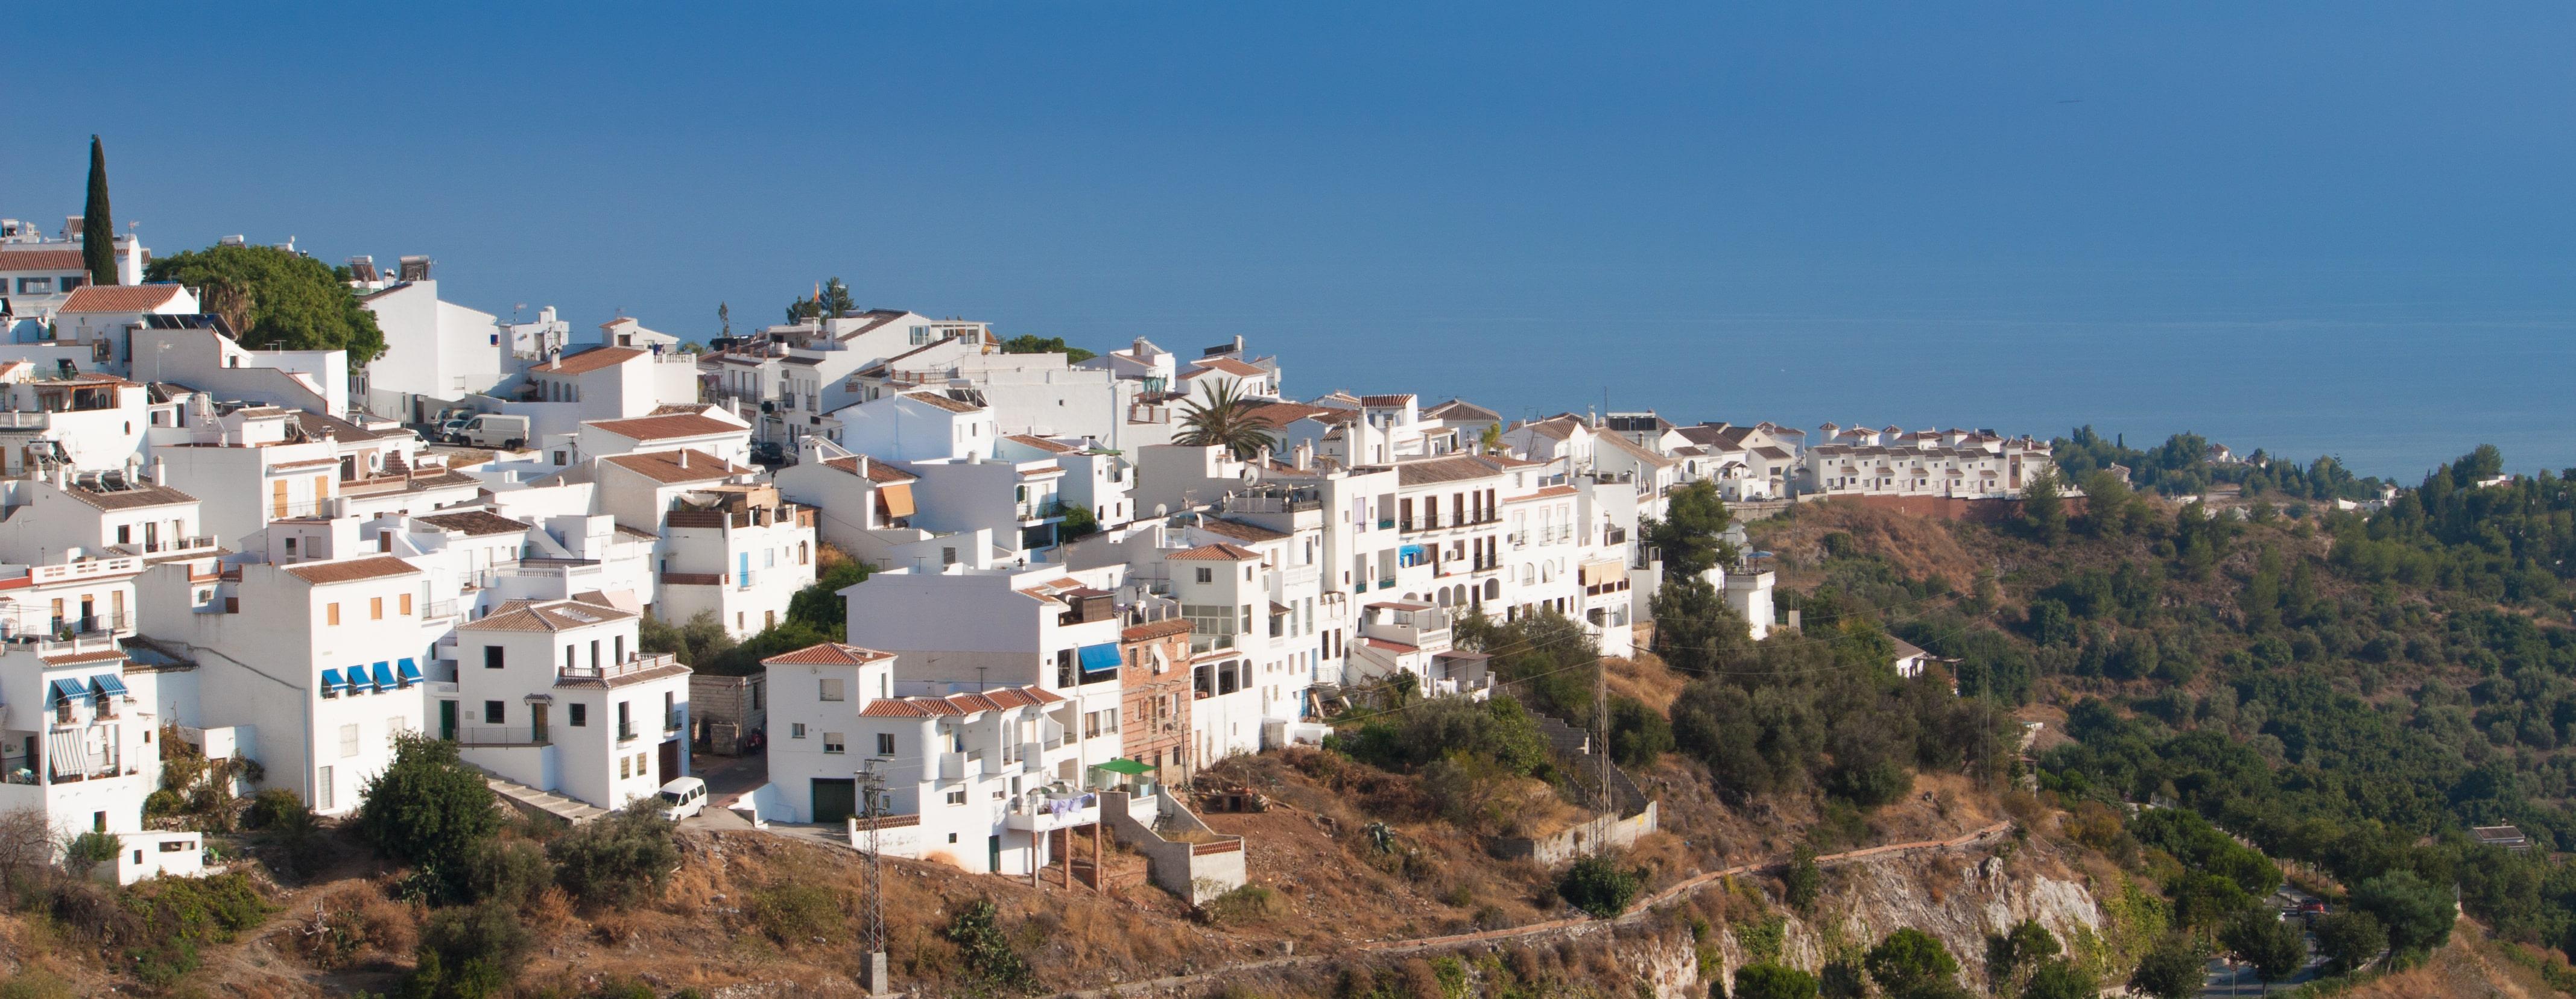 Where to stay in Spain for Mediterranean beauty? Frigiliana